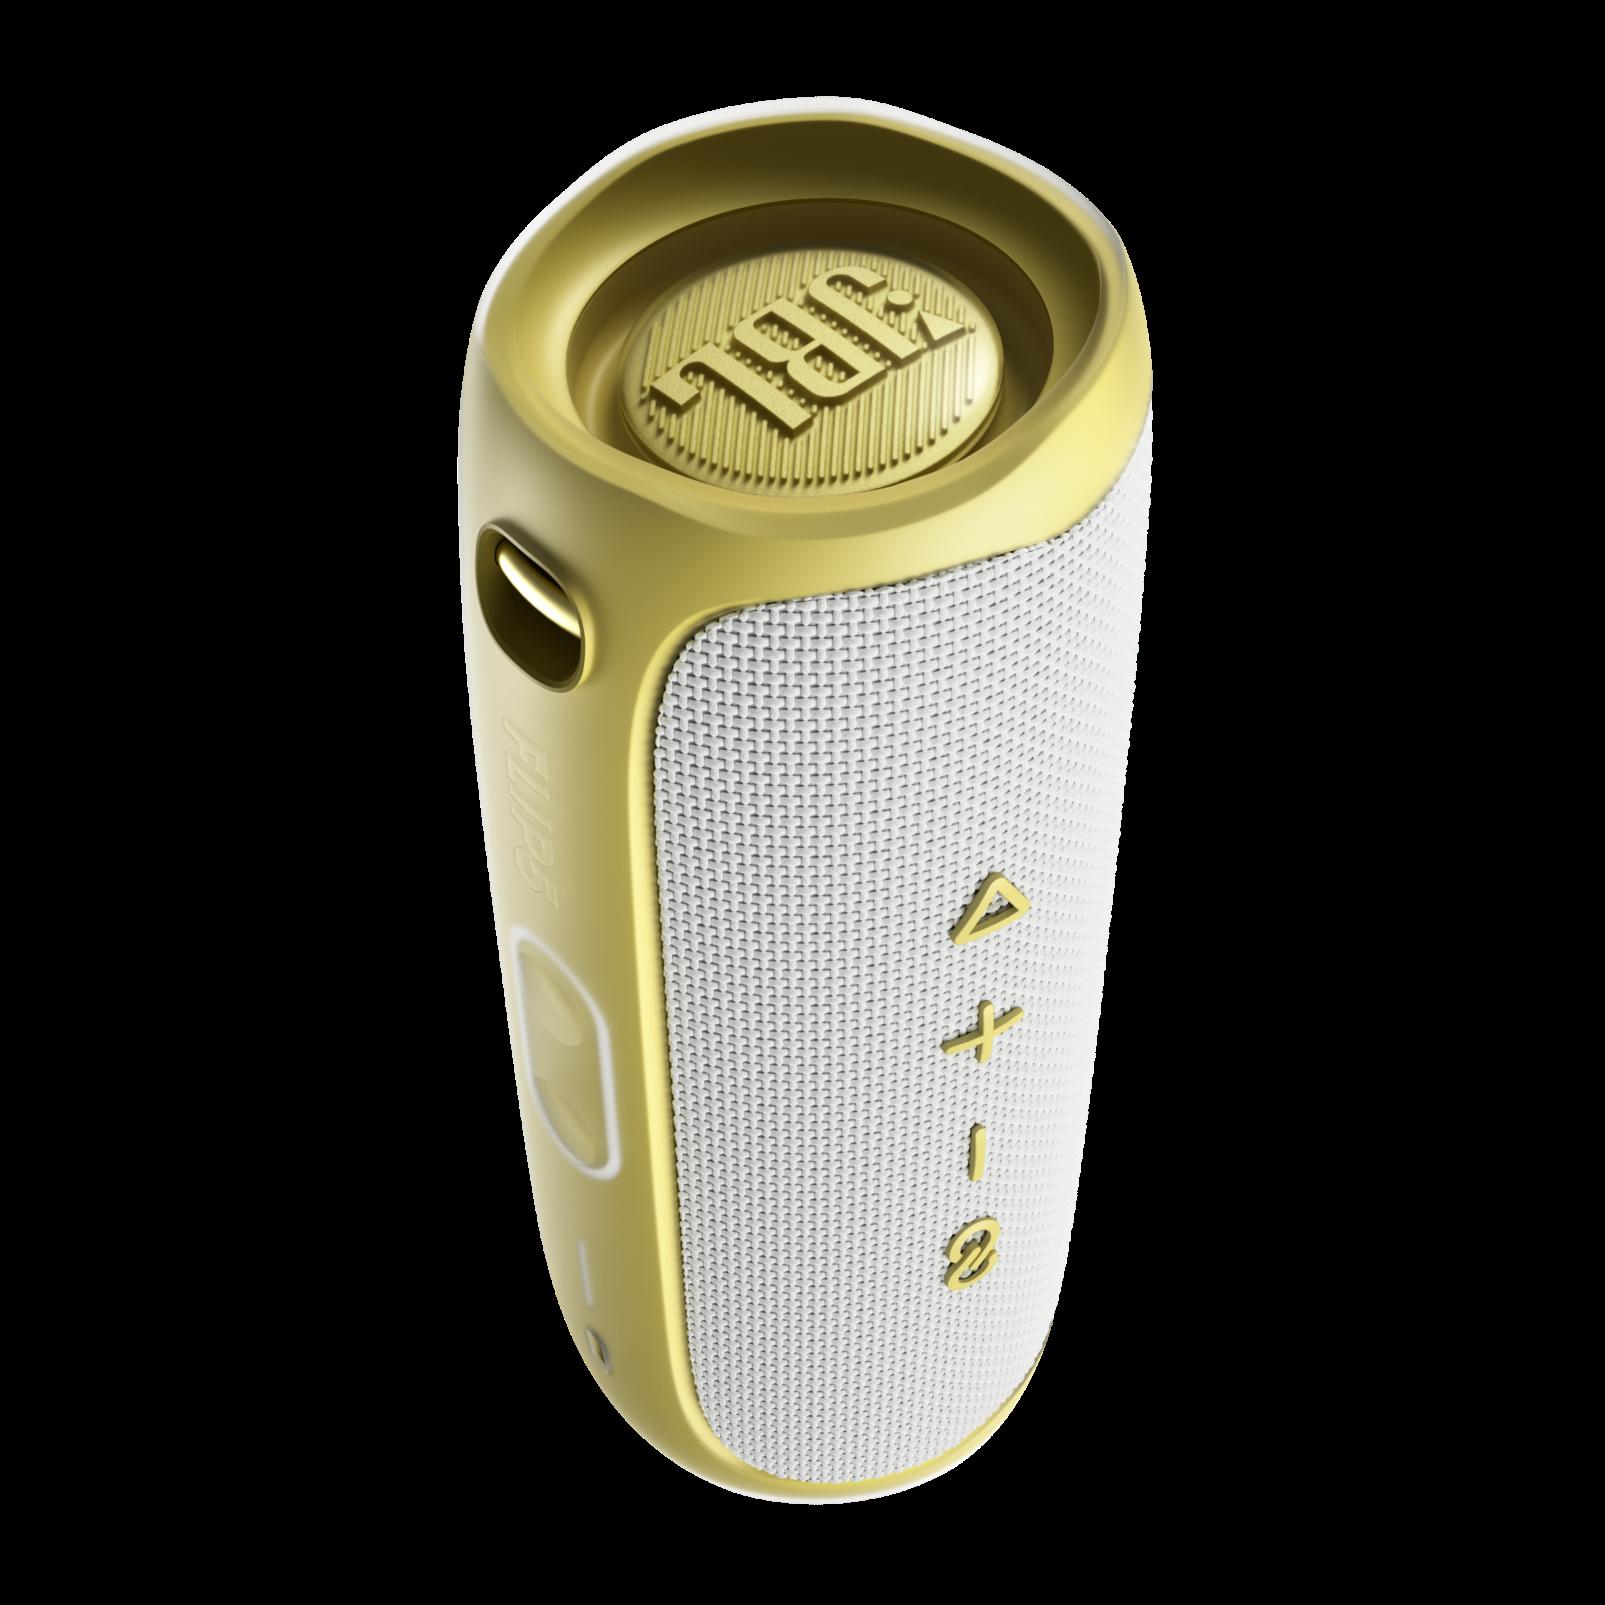 JBL Flip 5 Tomorrowland Edition - Gold/White - Portable Waterproof Speaker - Back